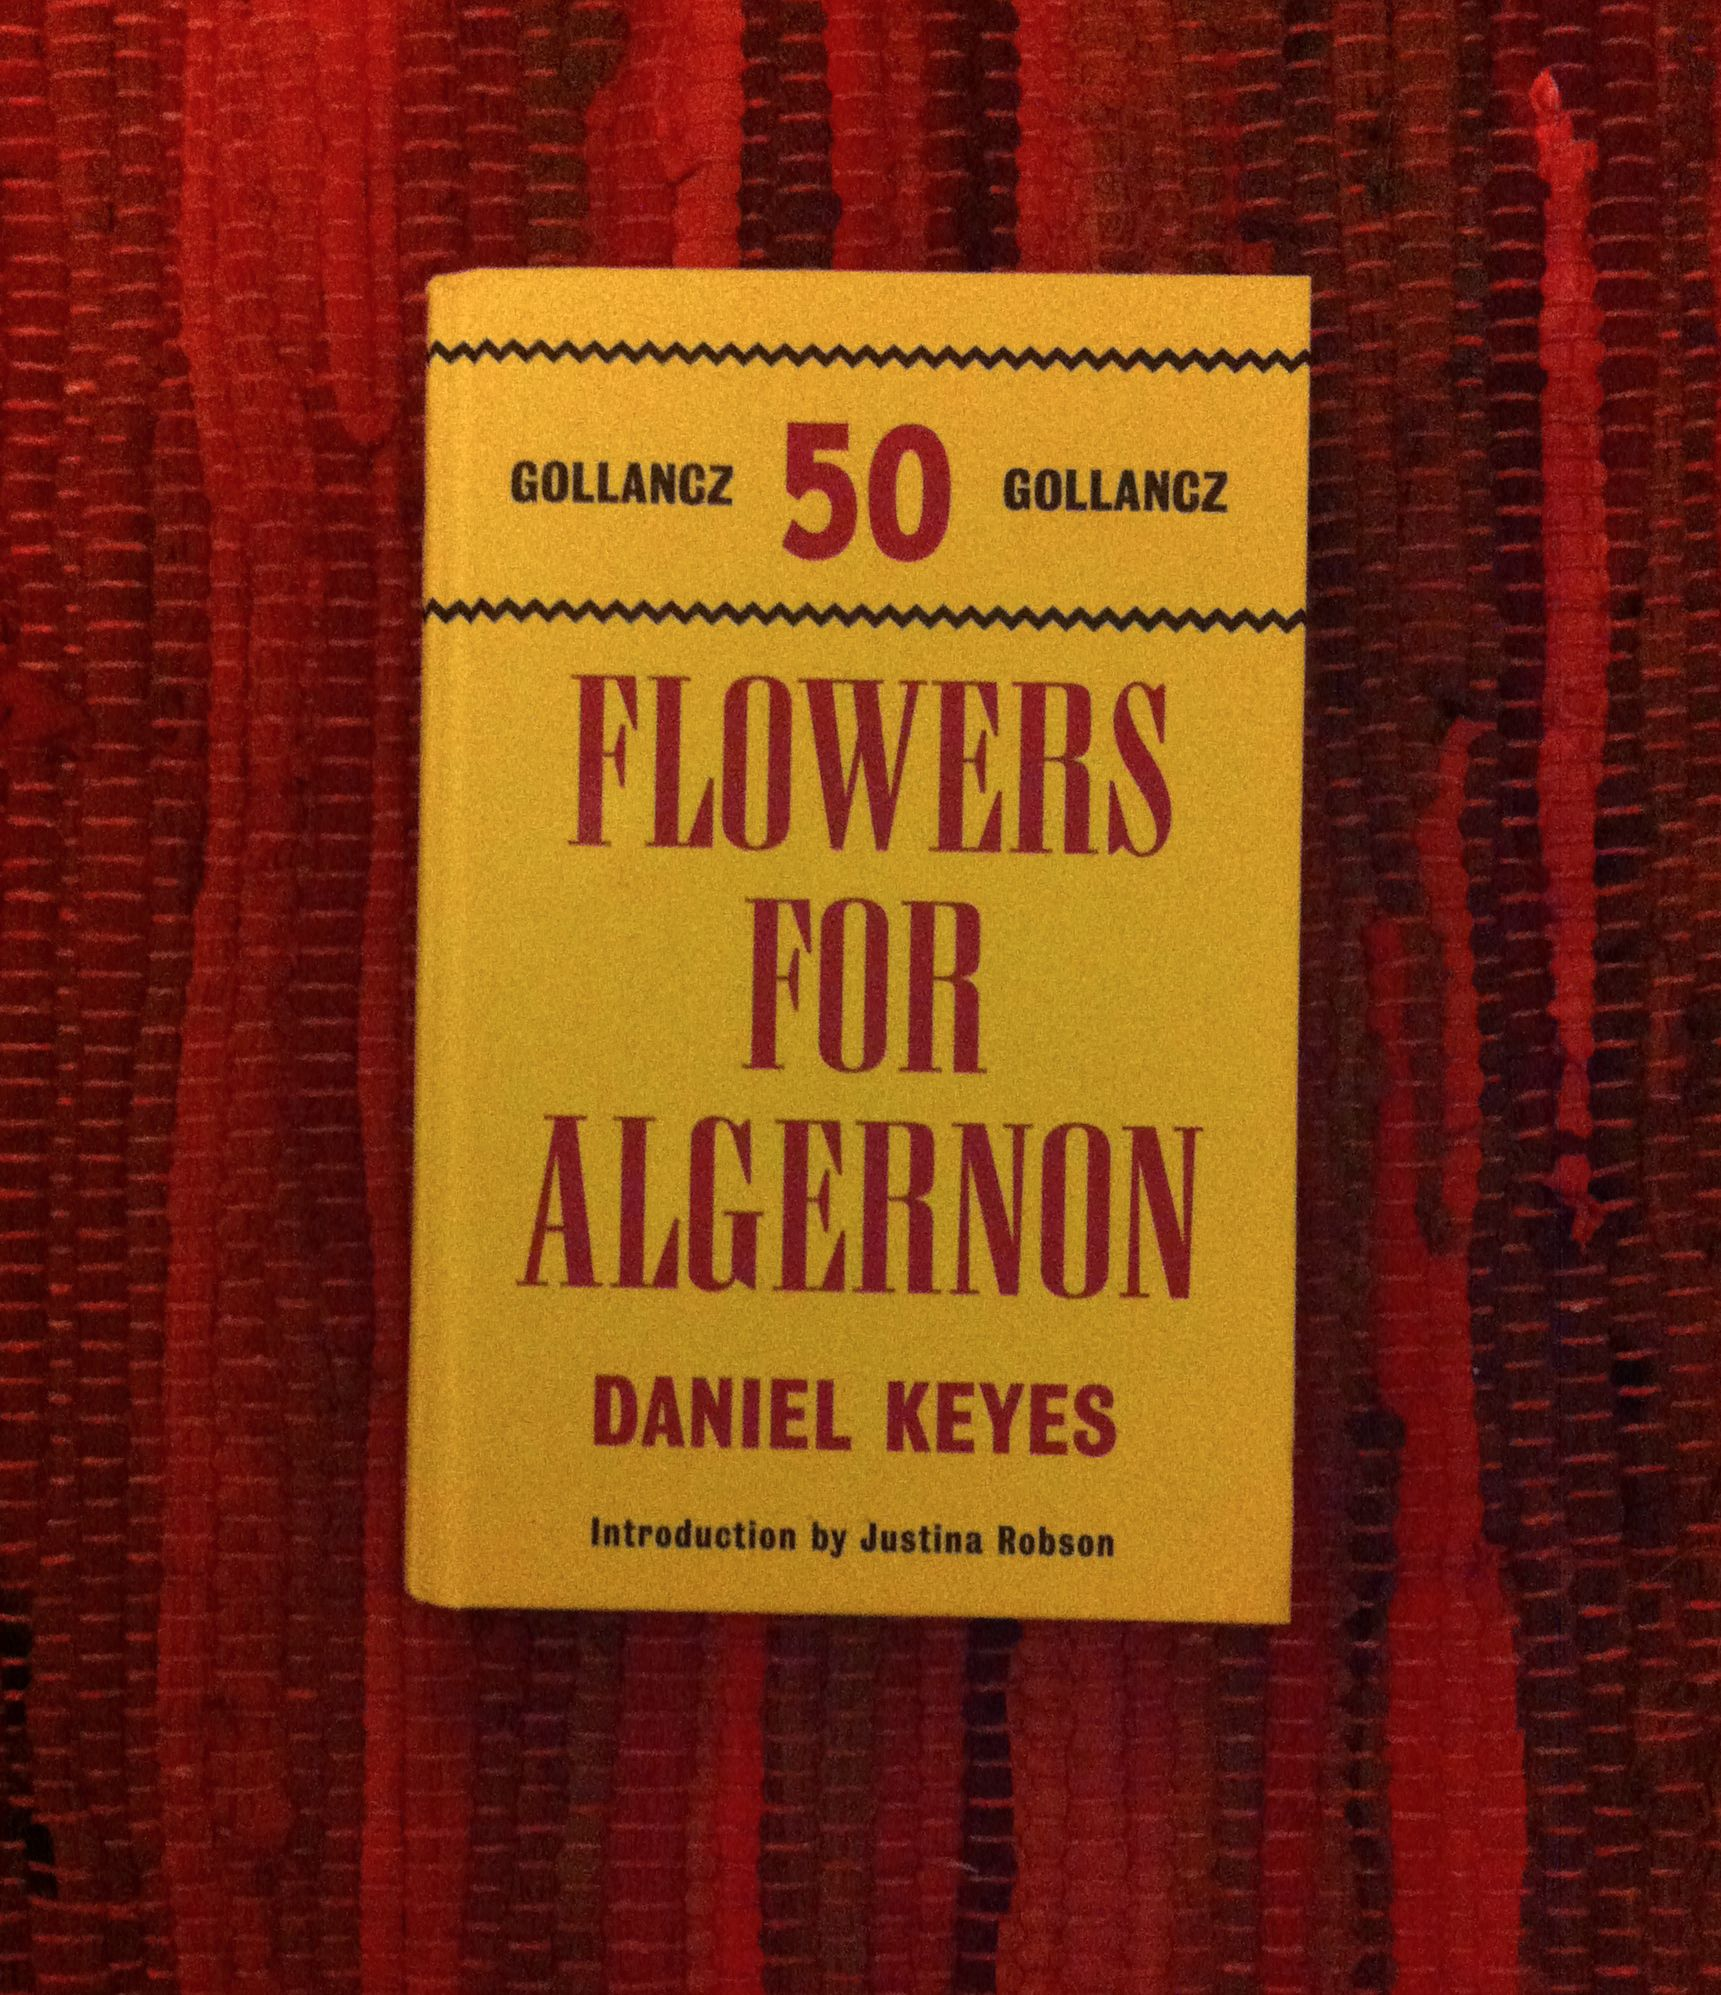 daniel keyes controversial novel quotes from daniel keyes novel flowers for algernon